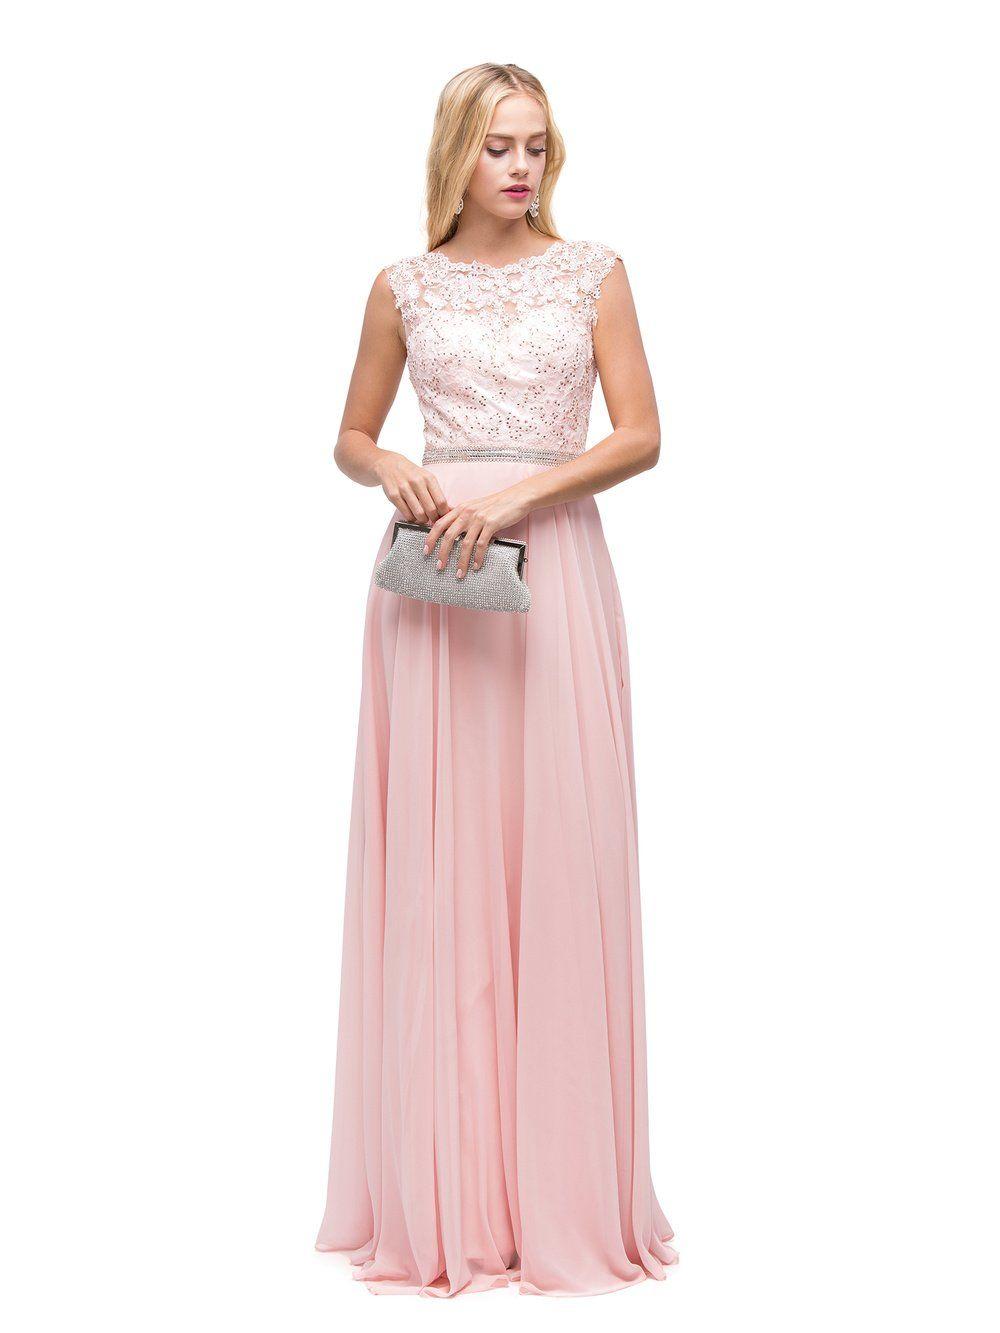 056c487c45 DQ 9675 - Pastel Prom Dress with Illusion-Lace Bodice   Chiffon ...